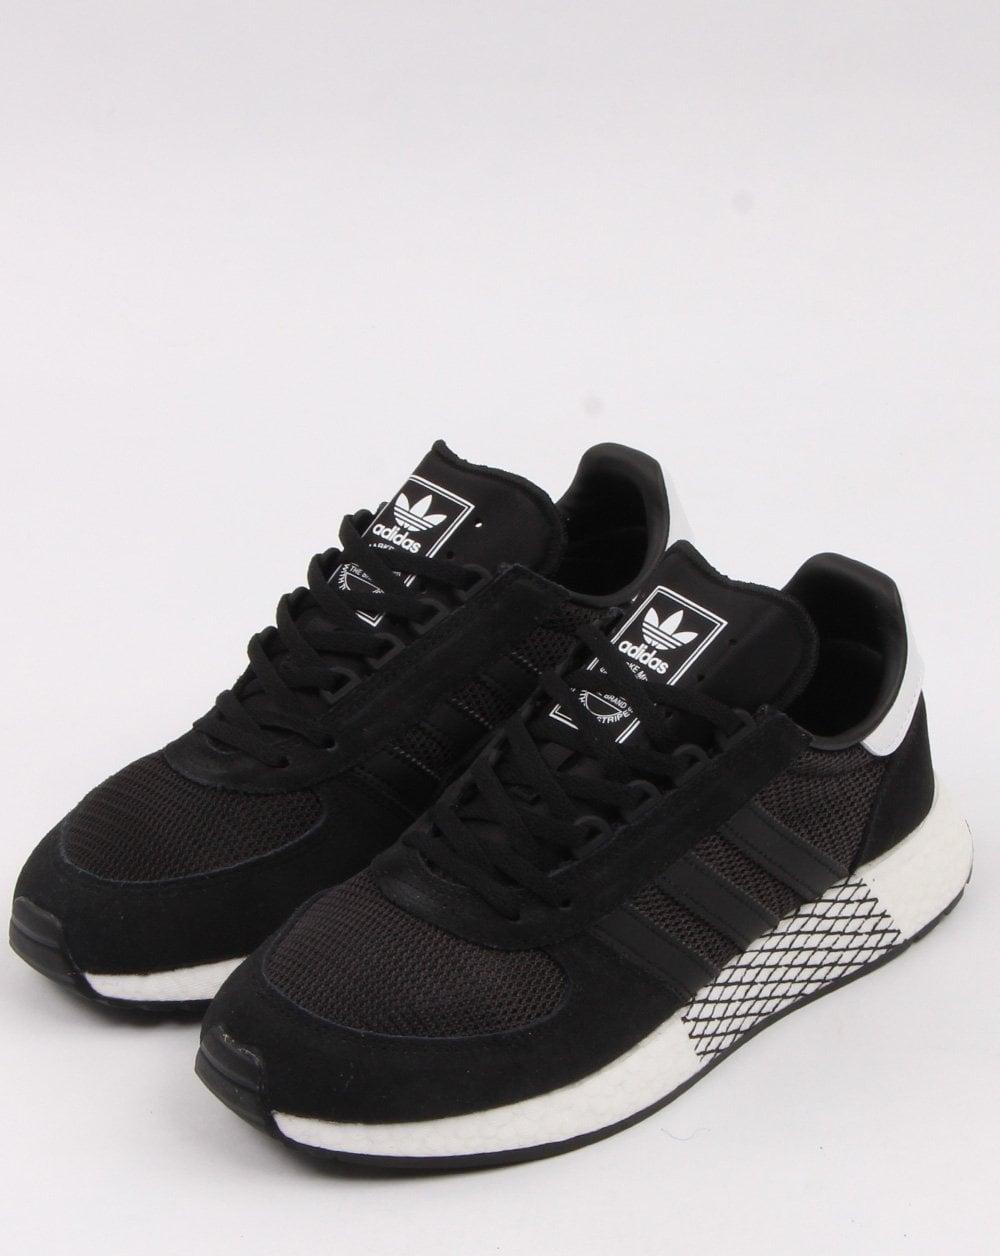 Adidas Marathon Tech Trainers Black